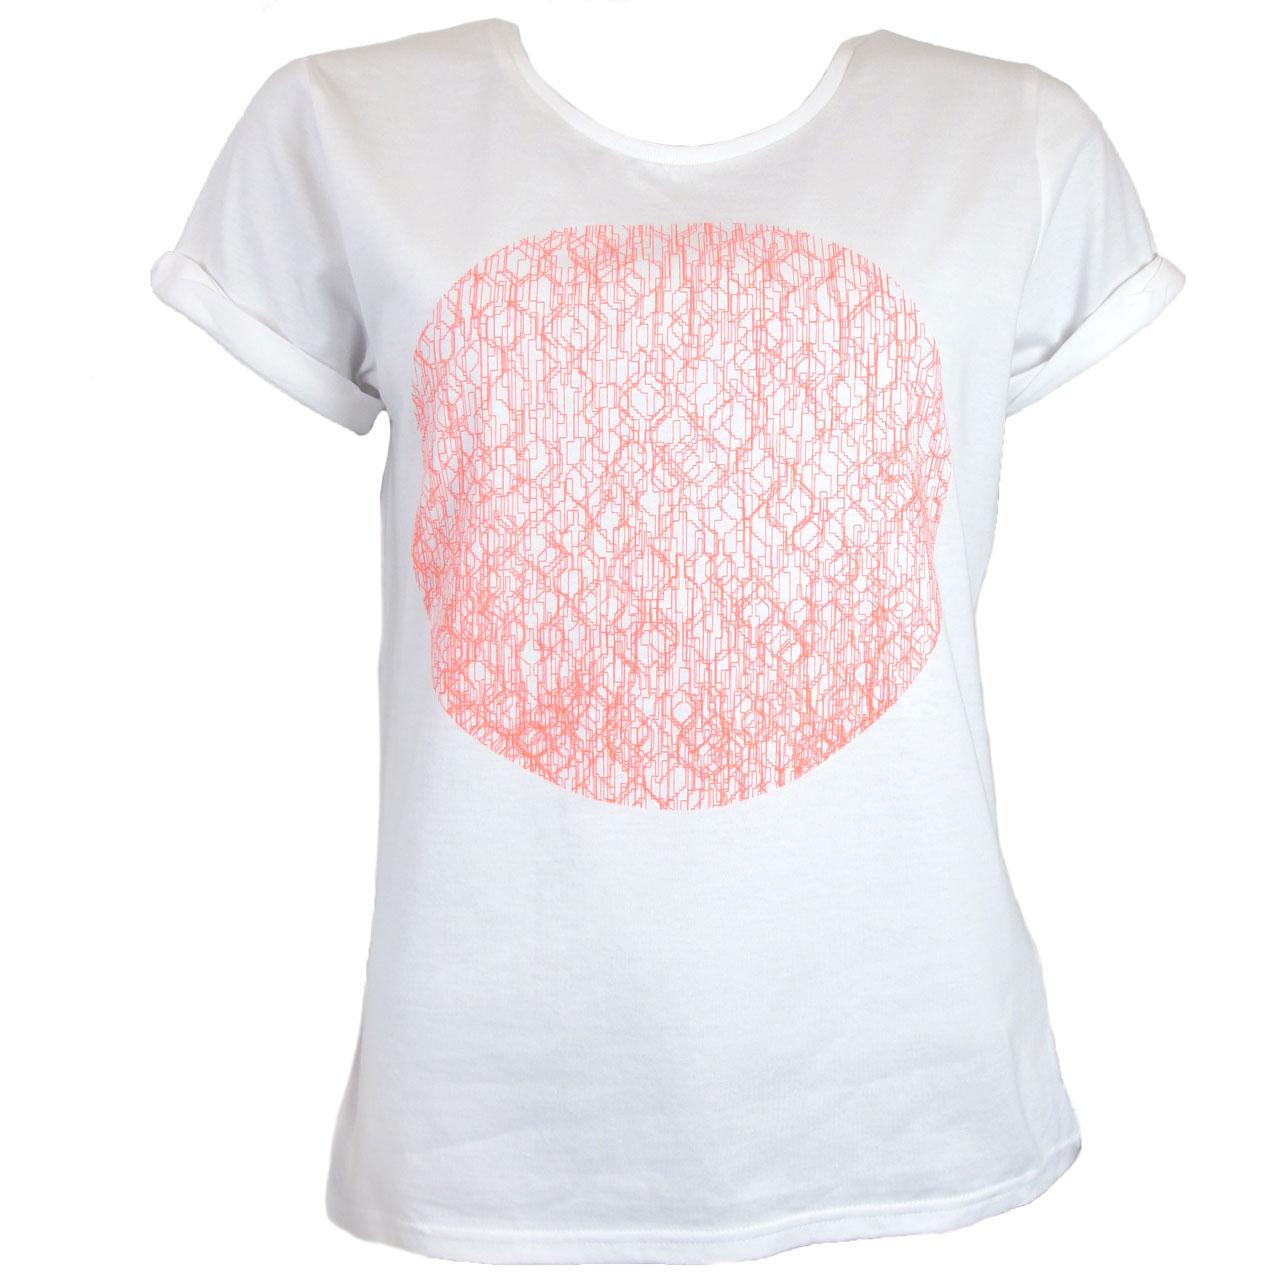 Berlin Design T-Shirt Fernsehturm Kreis weiß/neonorange